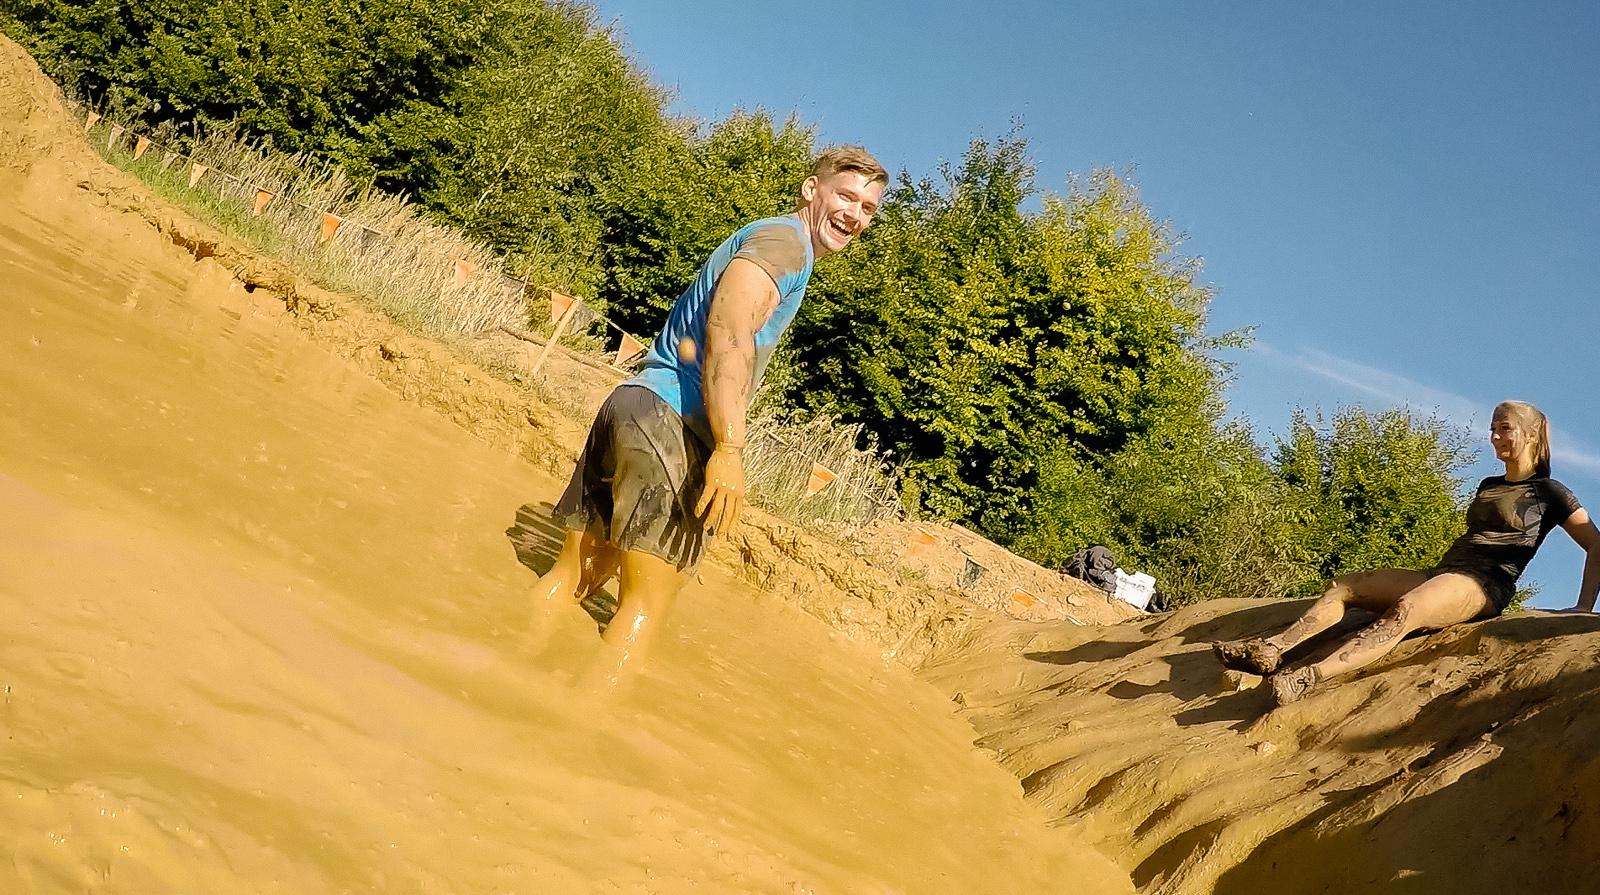 fitnessblog-fitnessblogger-fitness-blog-blogger-stuttgart-dreamteamfitness-tough-mudder-37